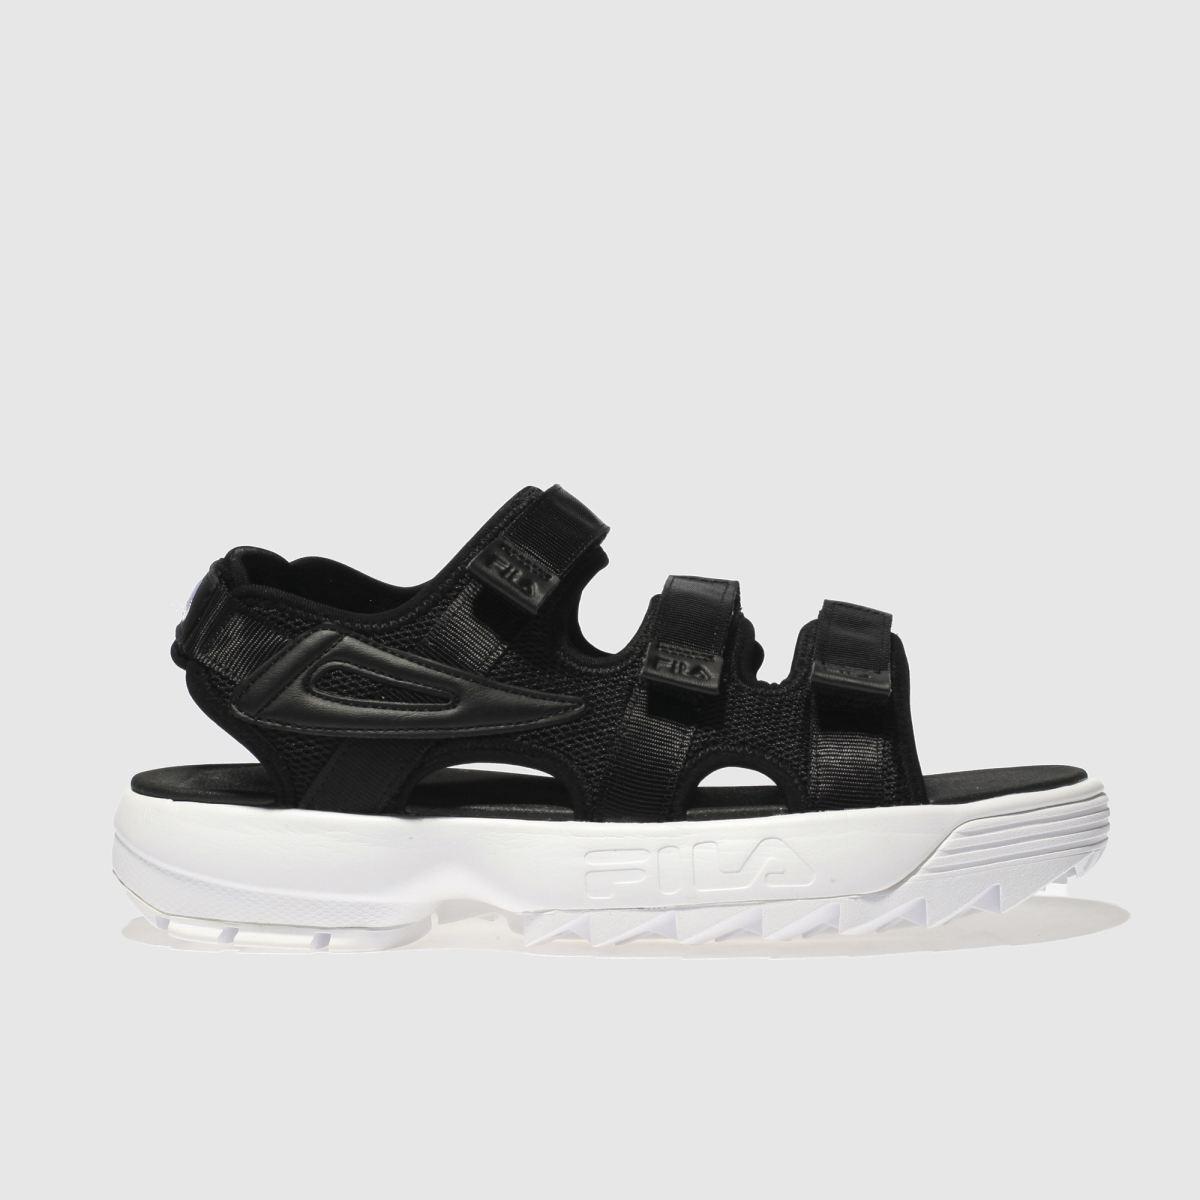 Fila Black & White Disruptor Sandals